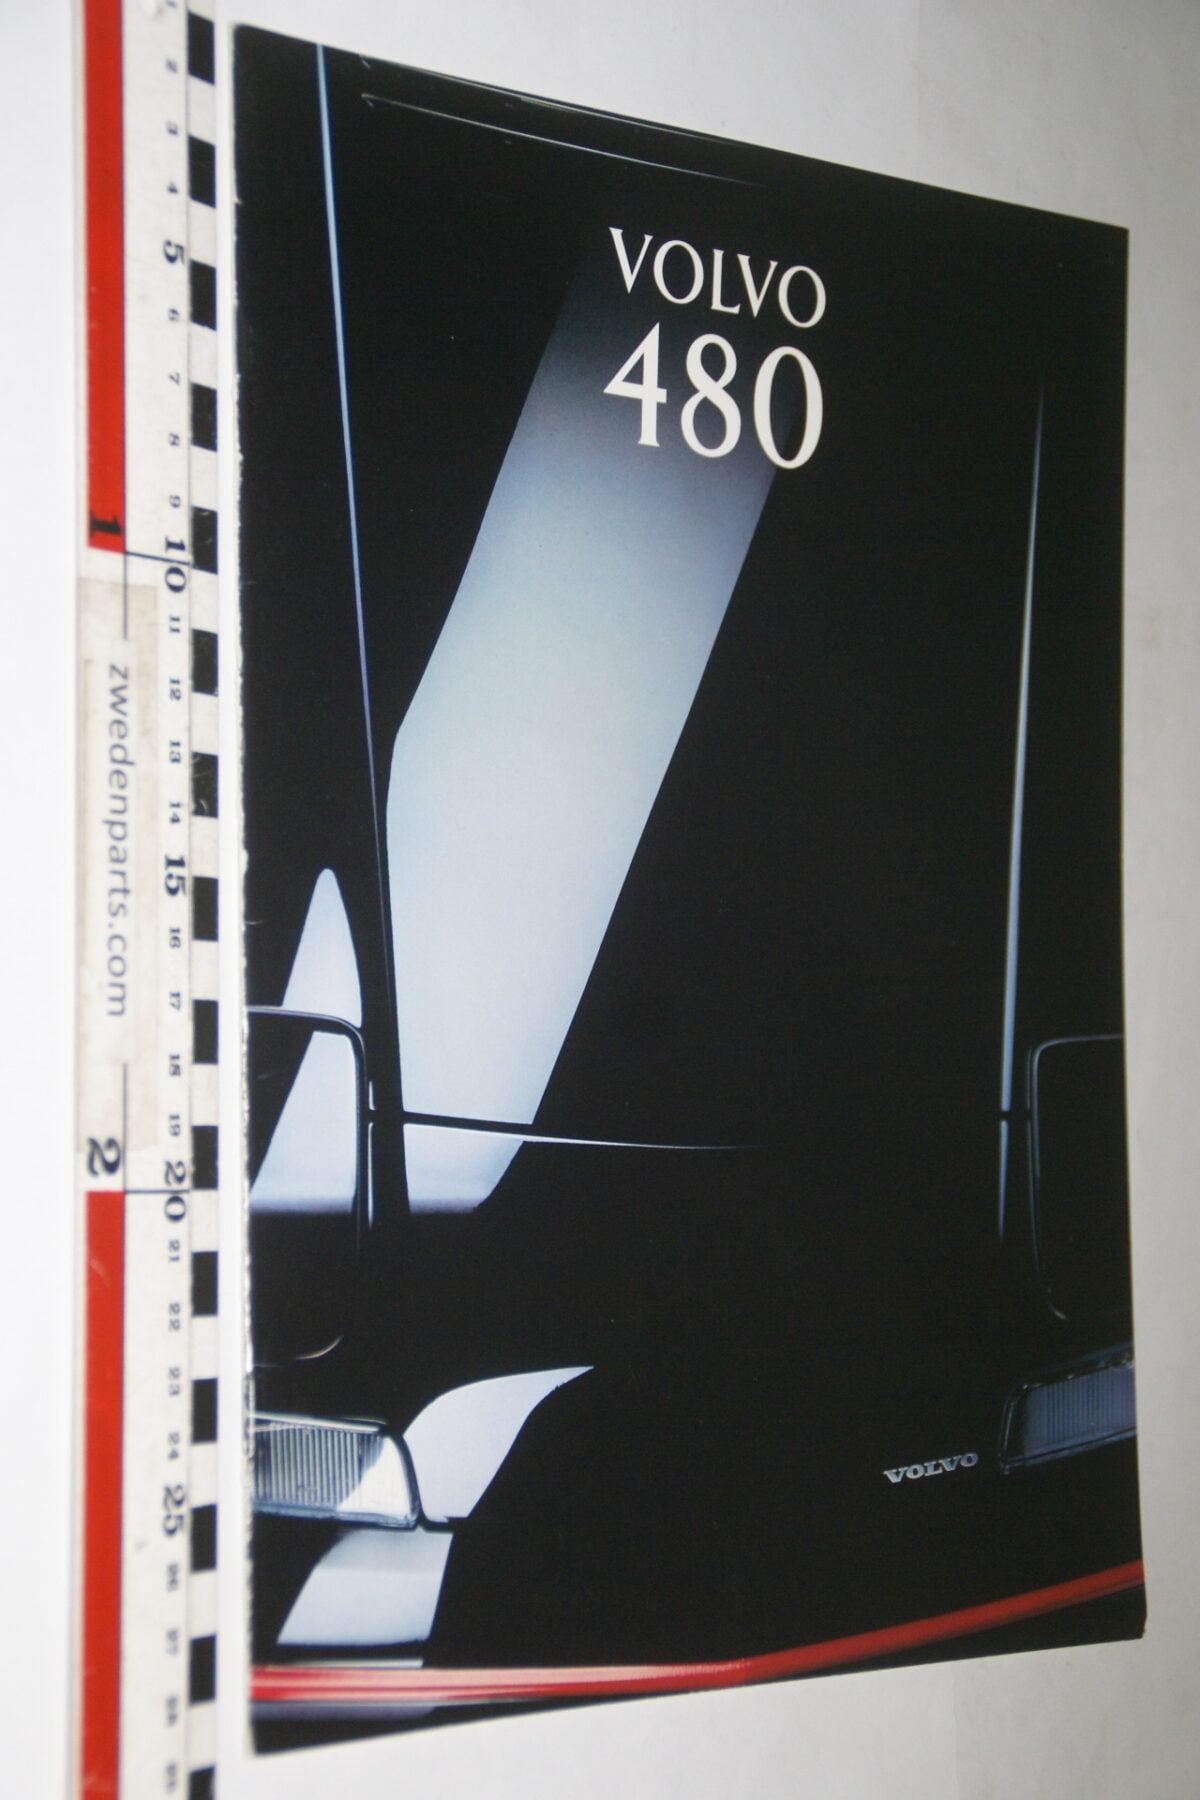 DSC03363 1993 originele brochure Volvo 480 nr. MSCD 8101-703456bd